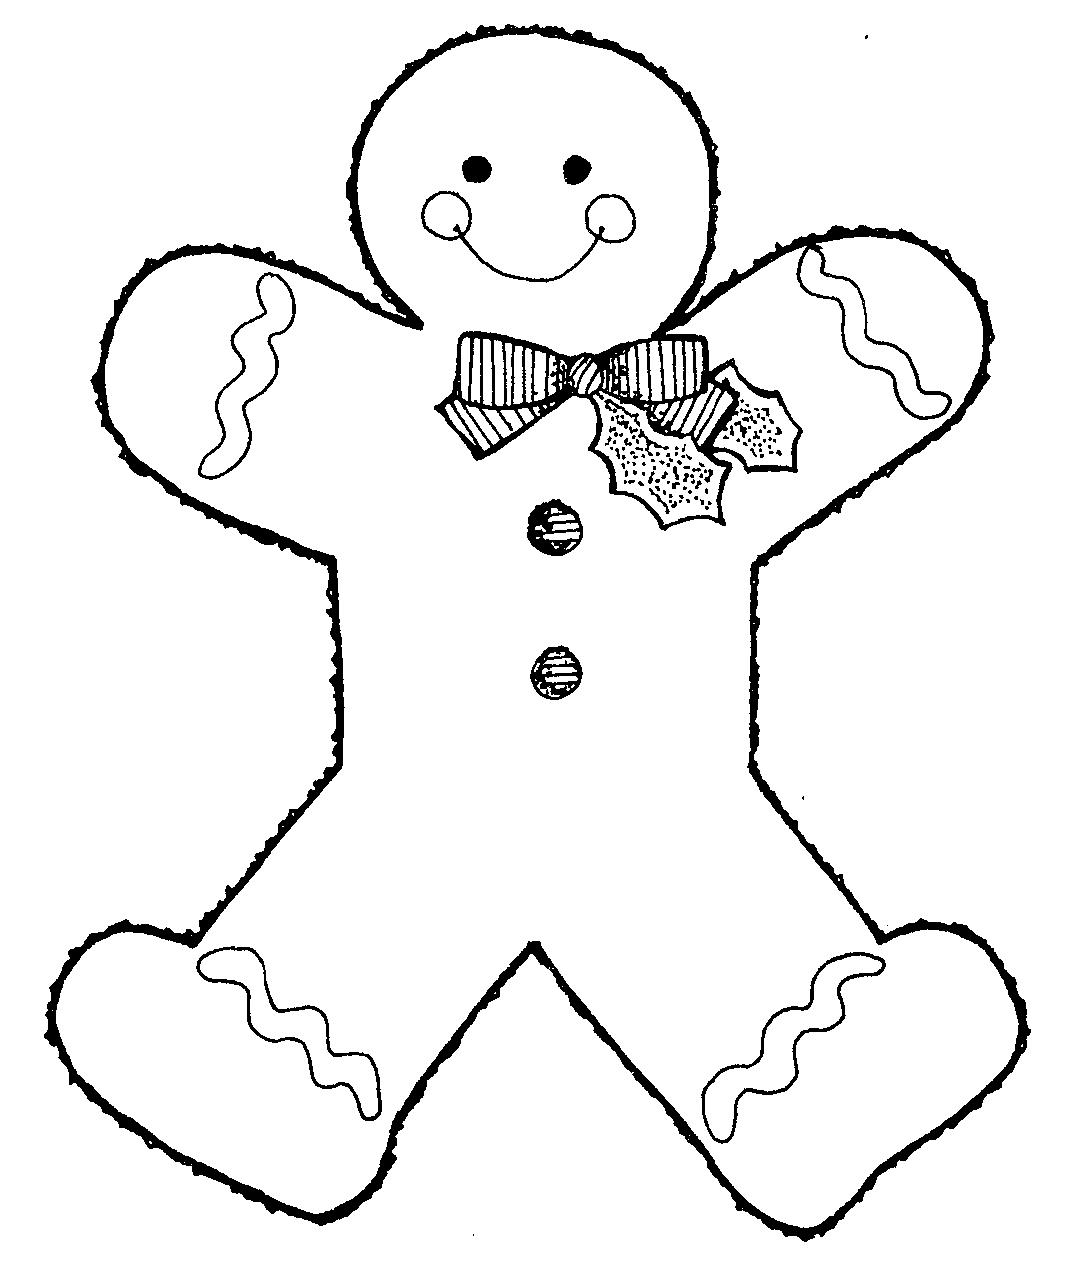 Gingerbread Man Outline - ClipArt Best - ClipArt Best